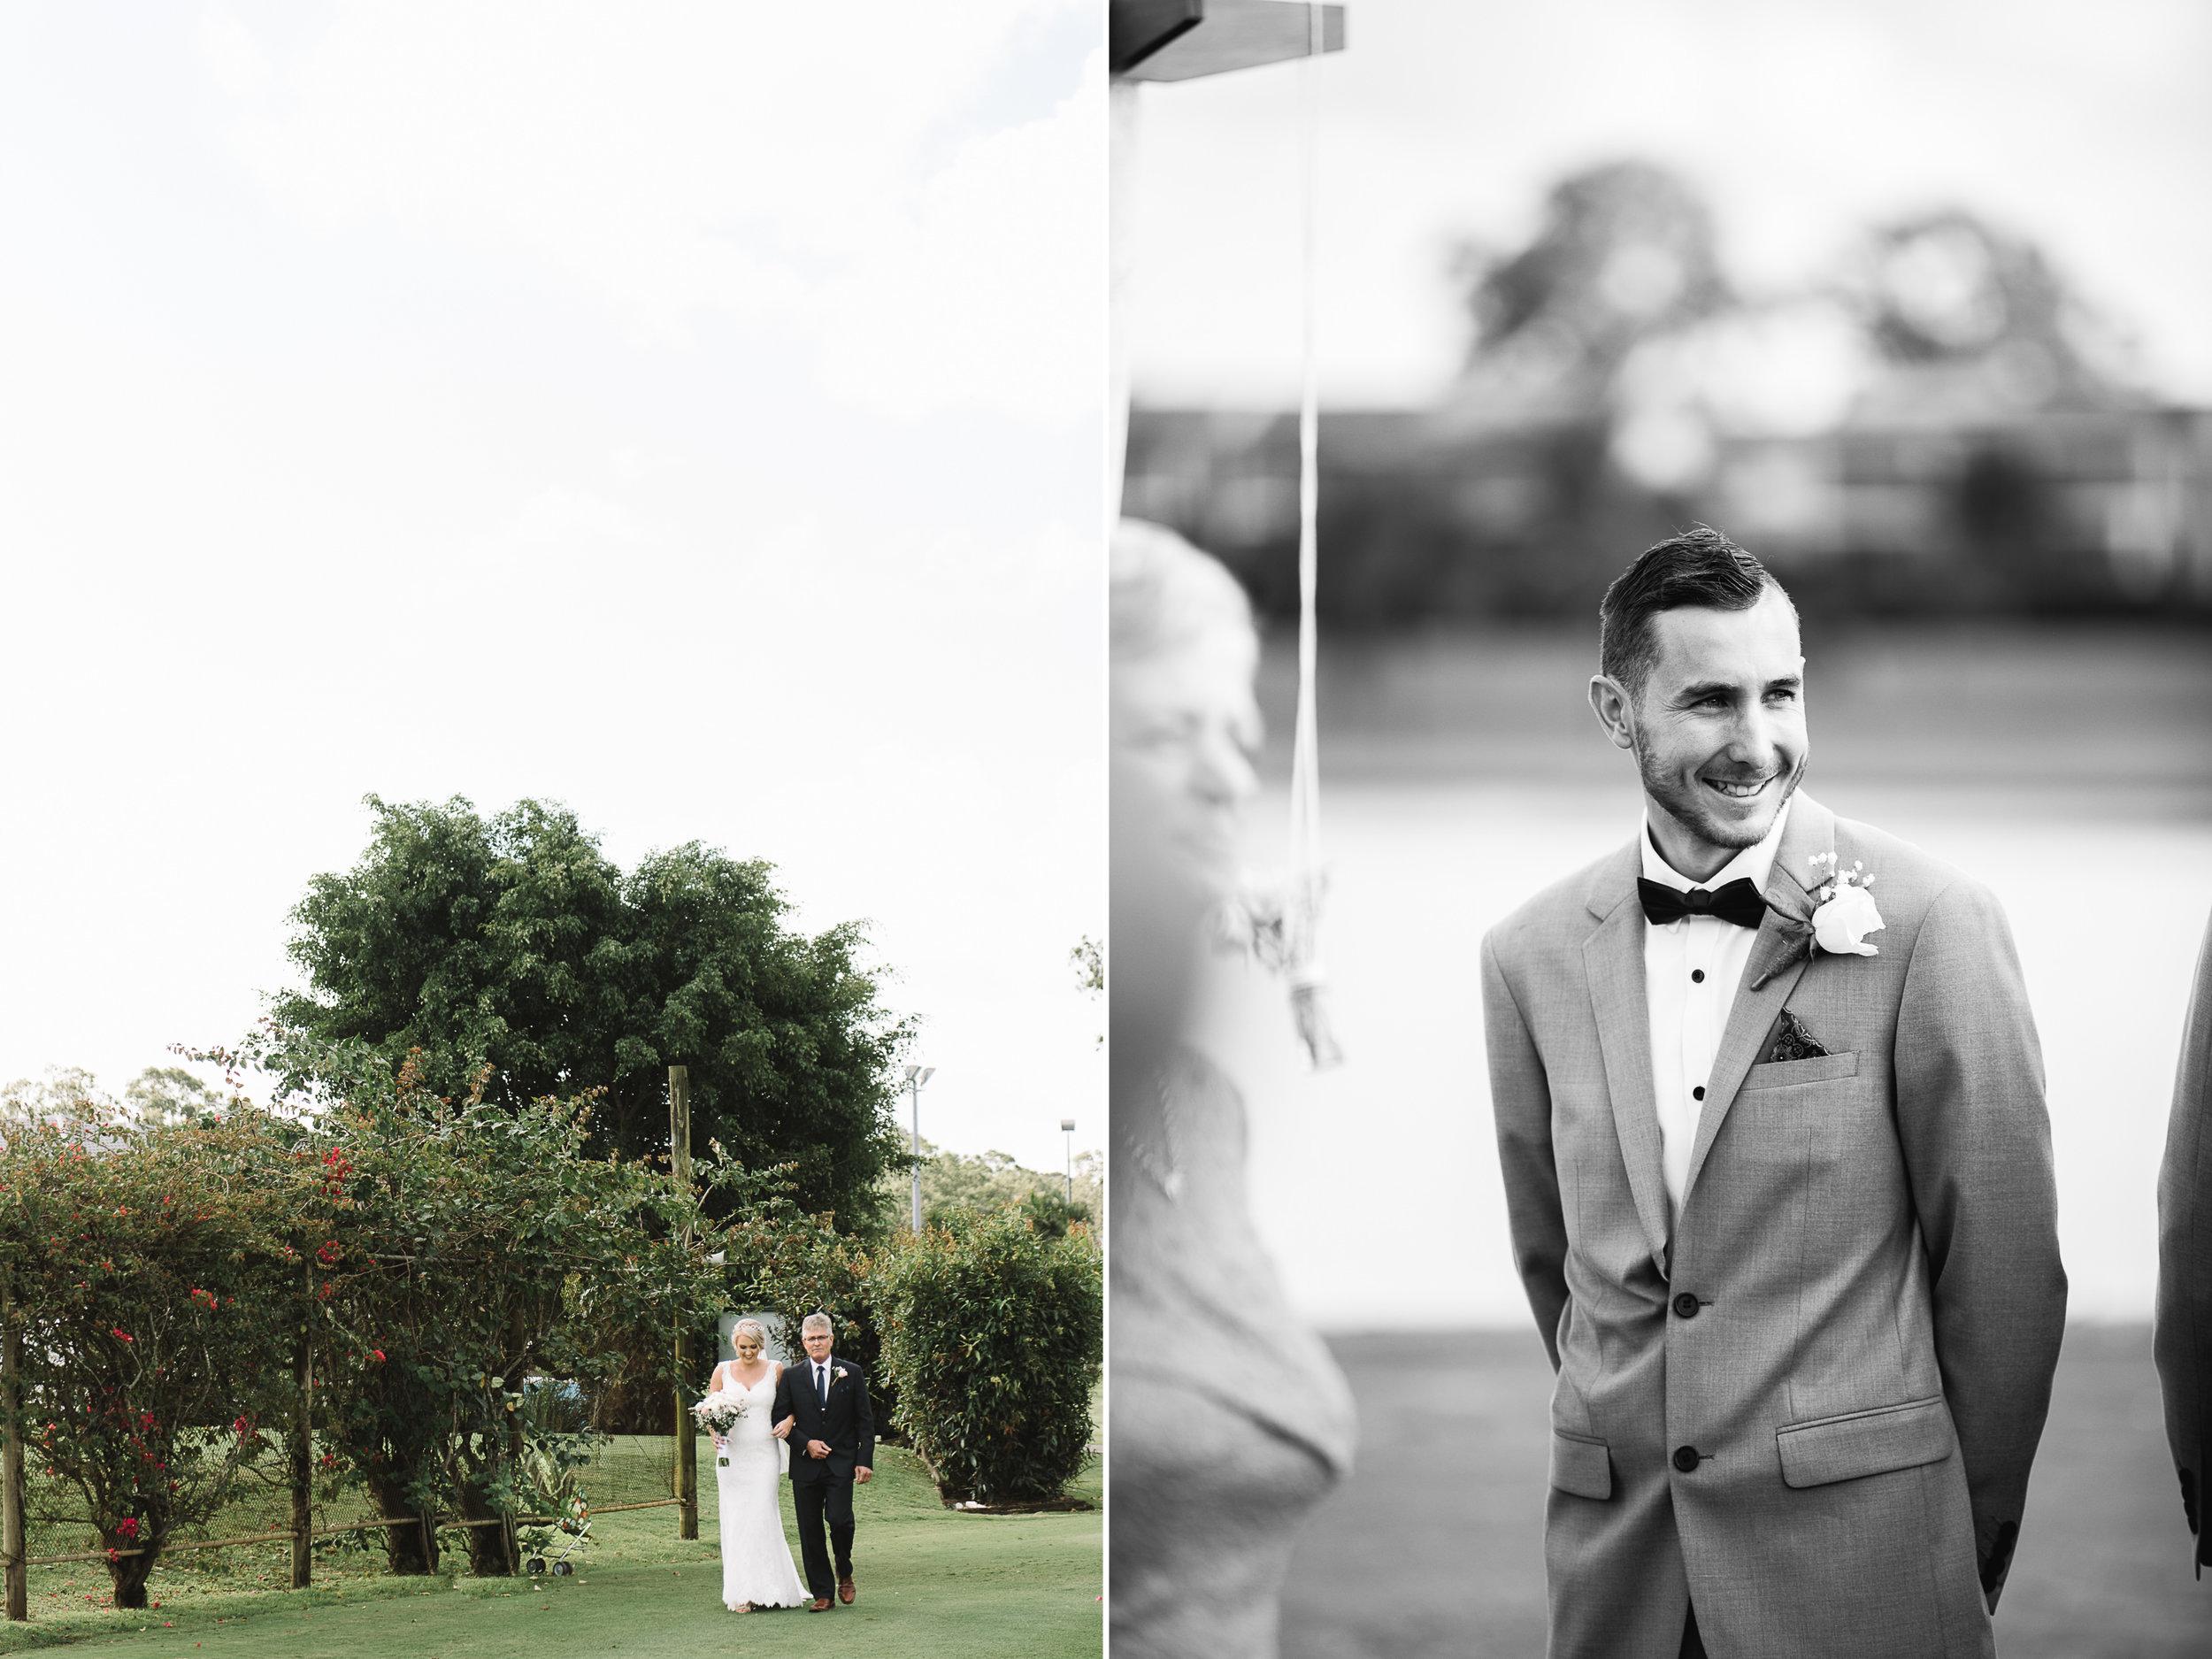 Brisbane-wedding-photography-15.jpg